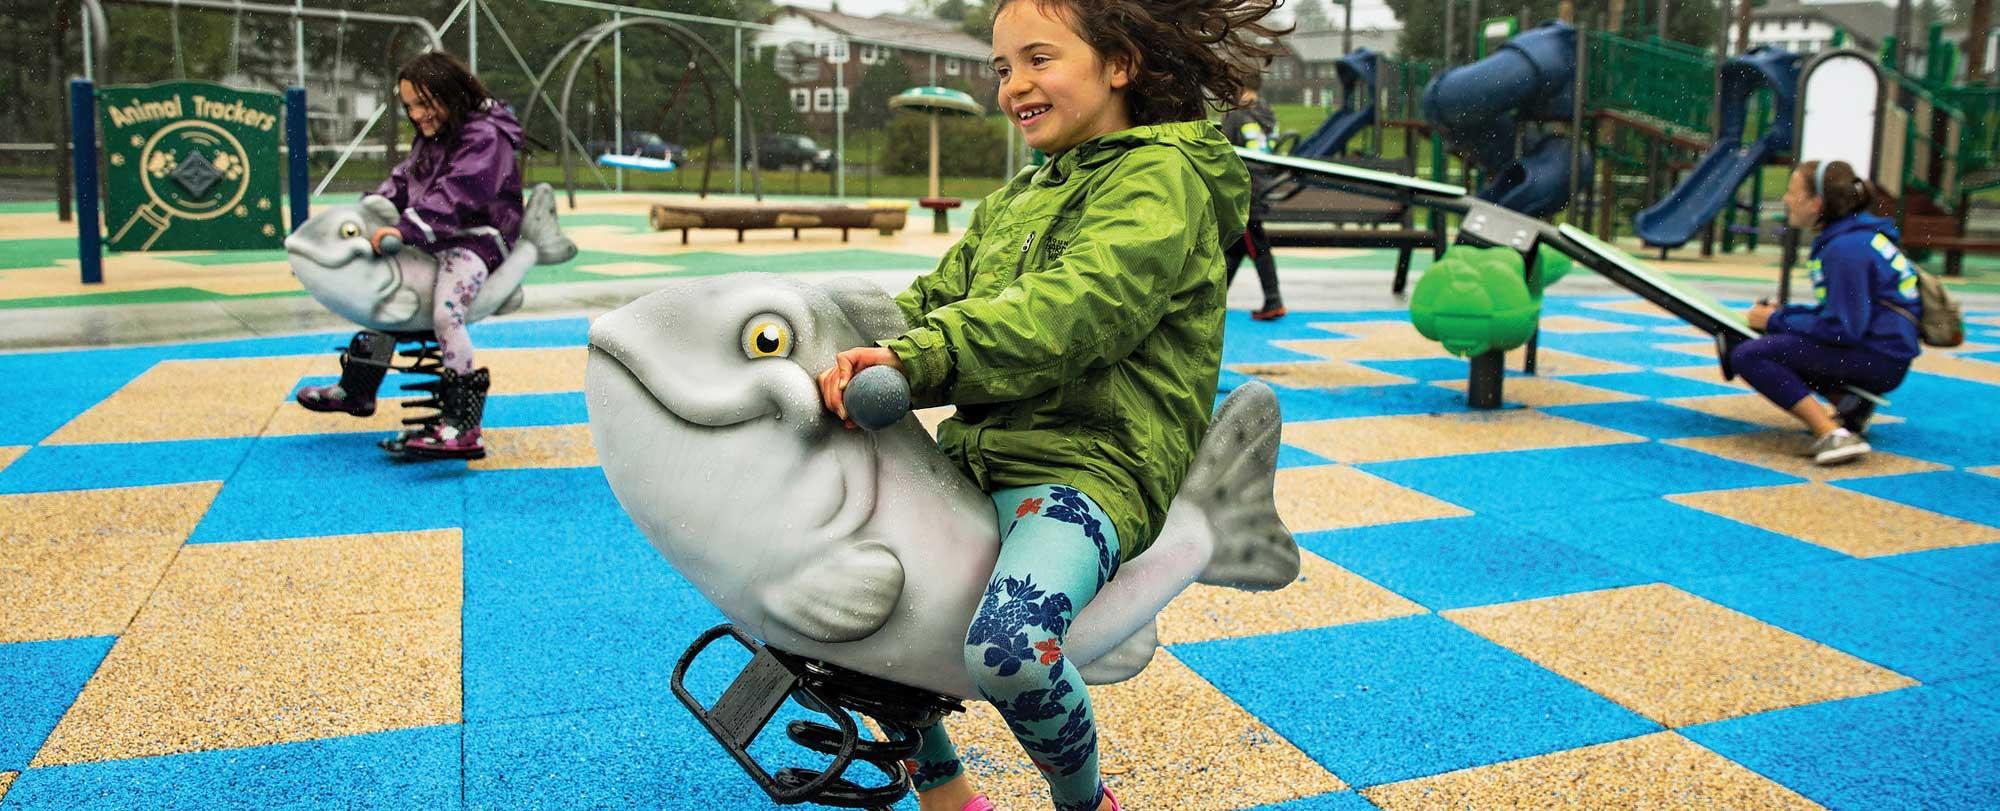 Playground Spring Rider